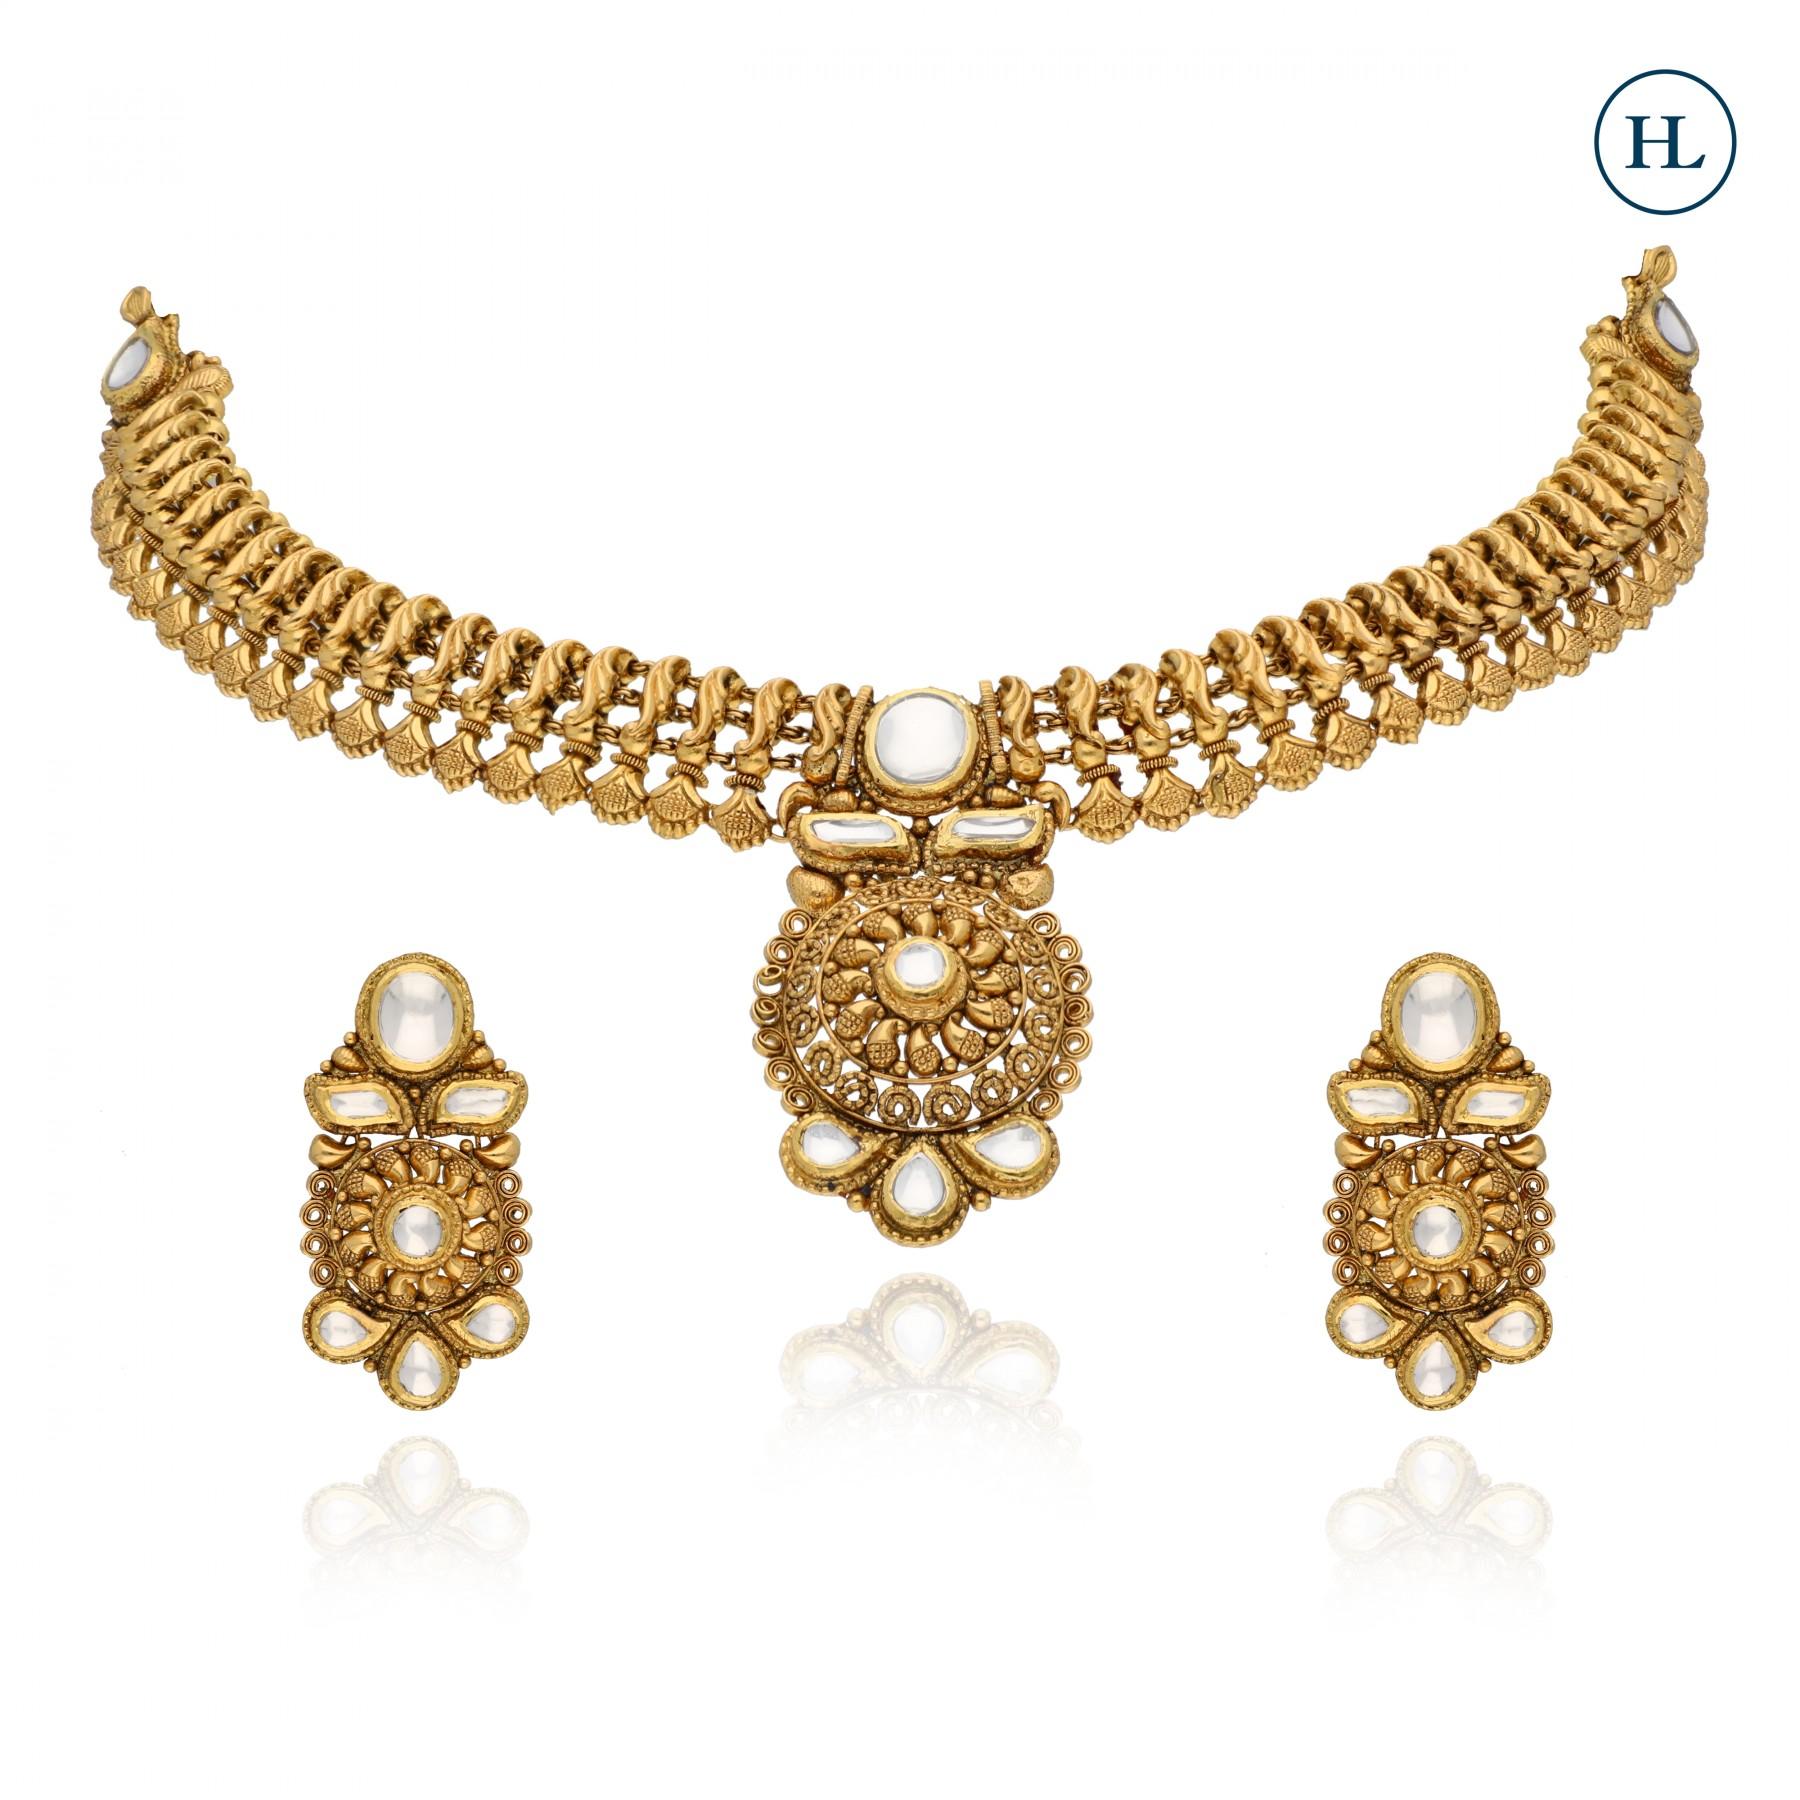 Antique-Styled Necklace Set